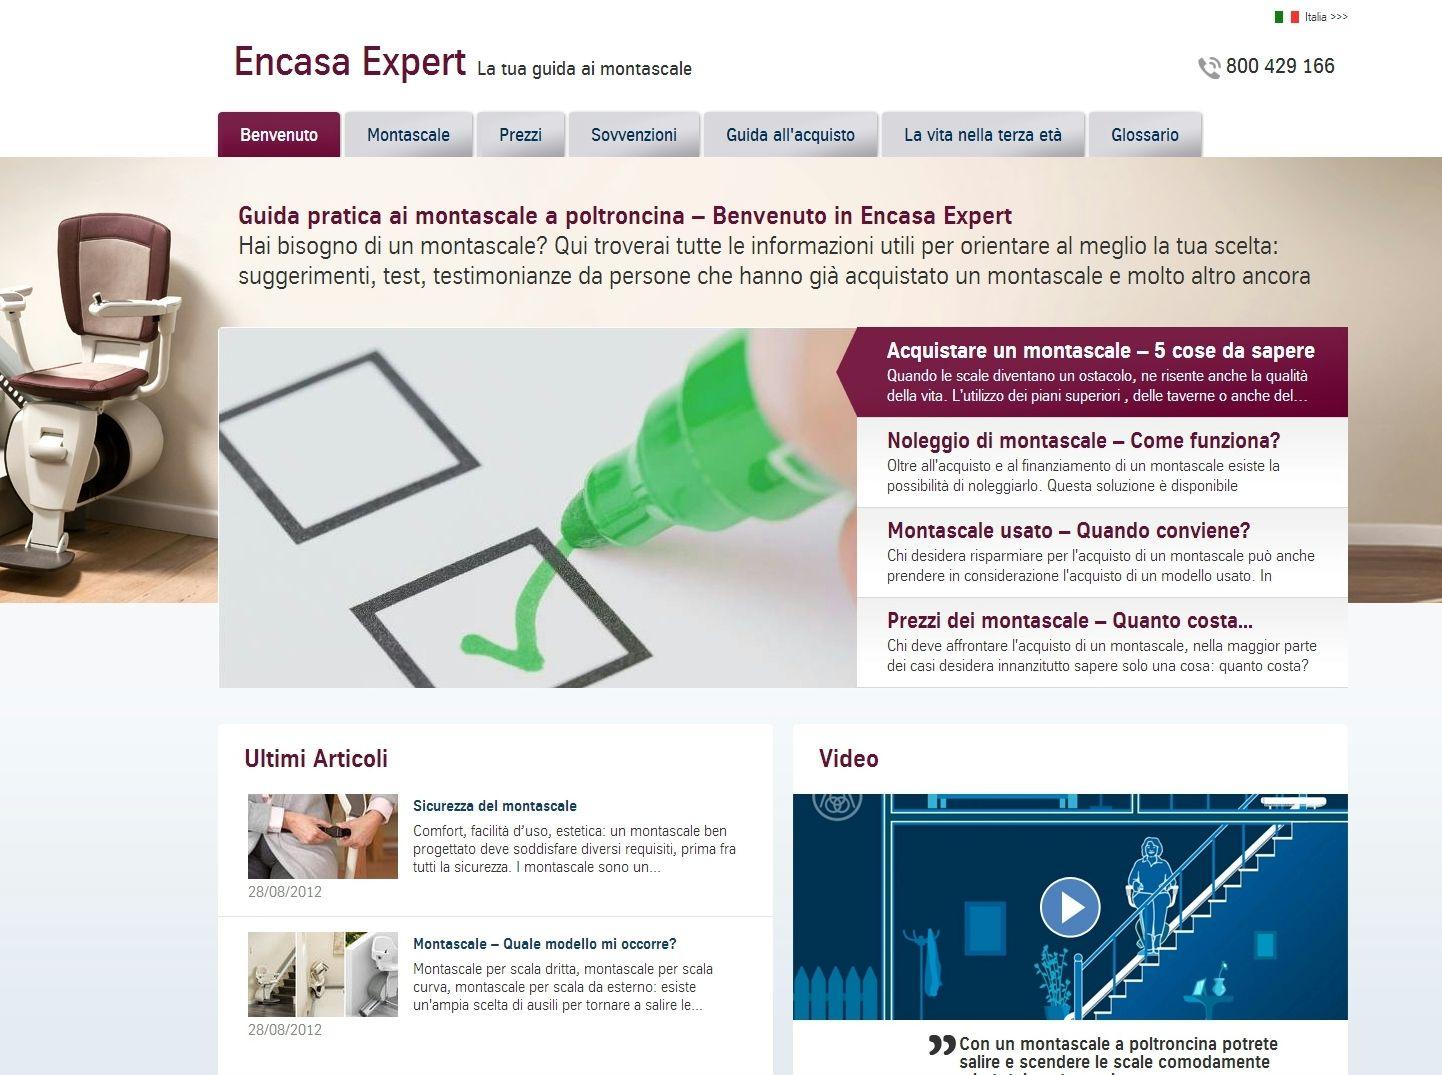 Arriva encasa-experts.com by ThyssenKrupp Encasa